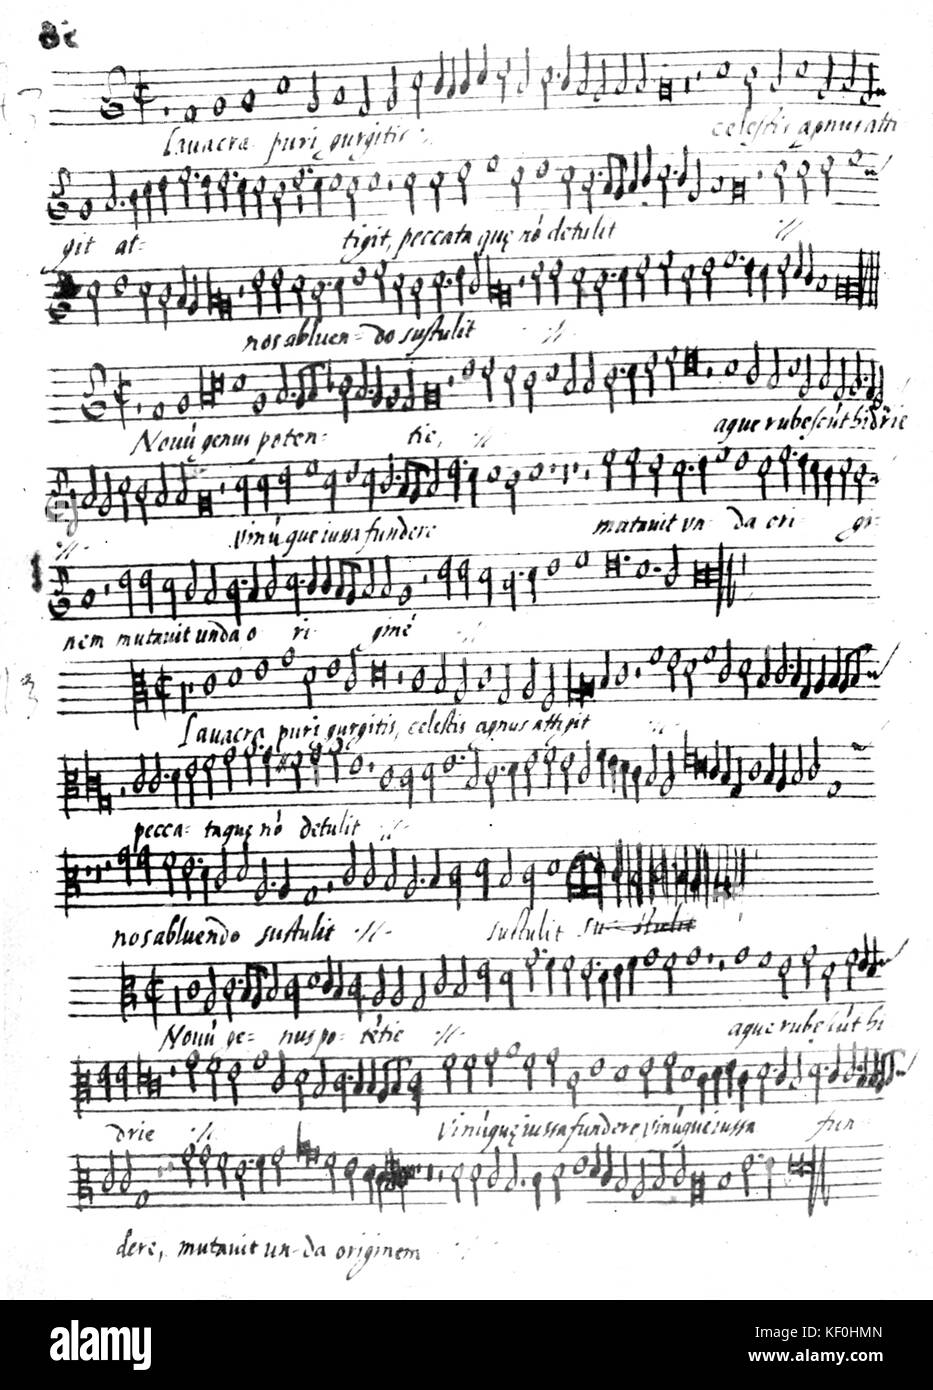 Music written in Palestrina 's hand.  Giovanni Pierluigi da Palestrina Italian composer 3 February 1525 - 2 - Stock Image